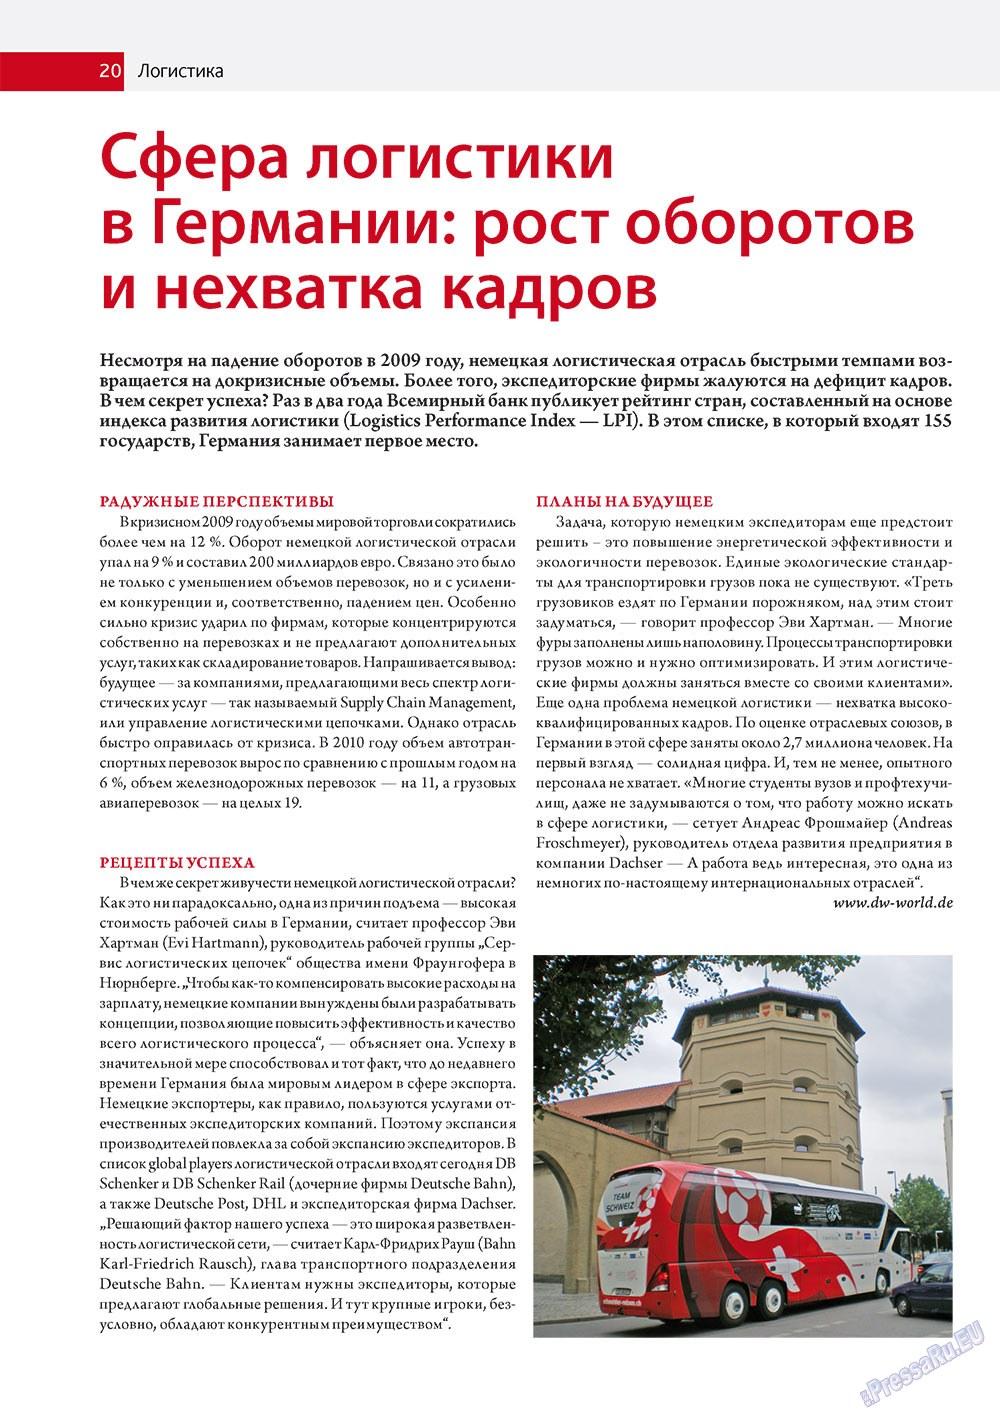 Бизнес парк (журнал). 2011 год, номер 4, стр. 20